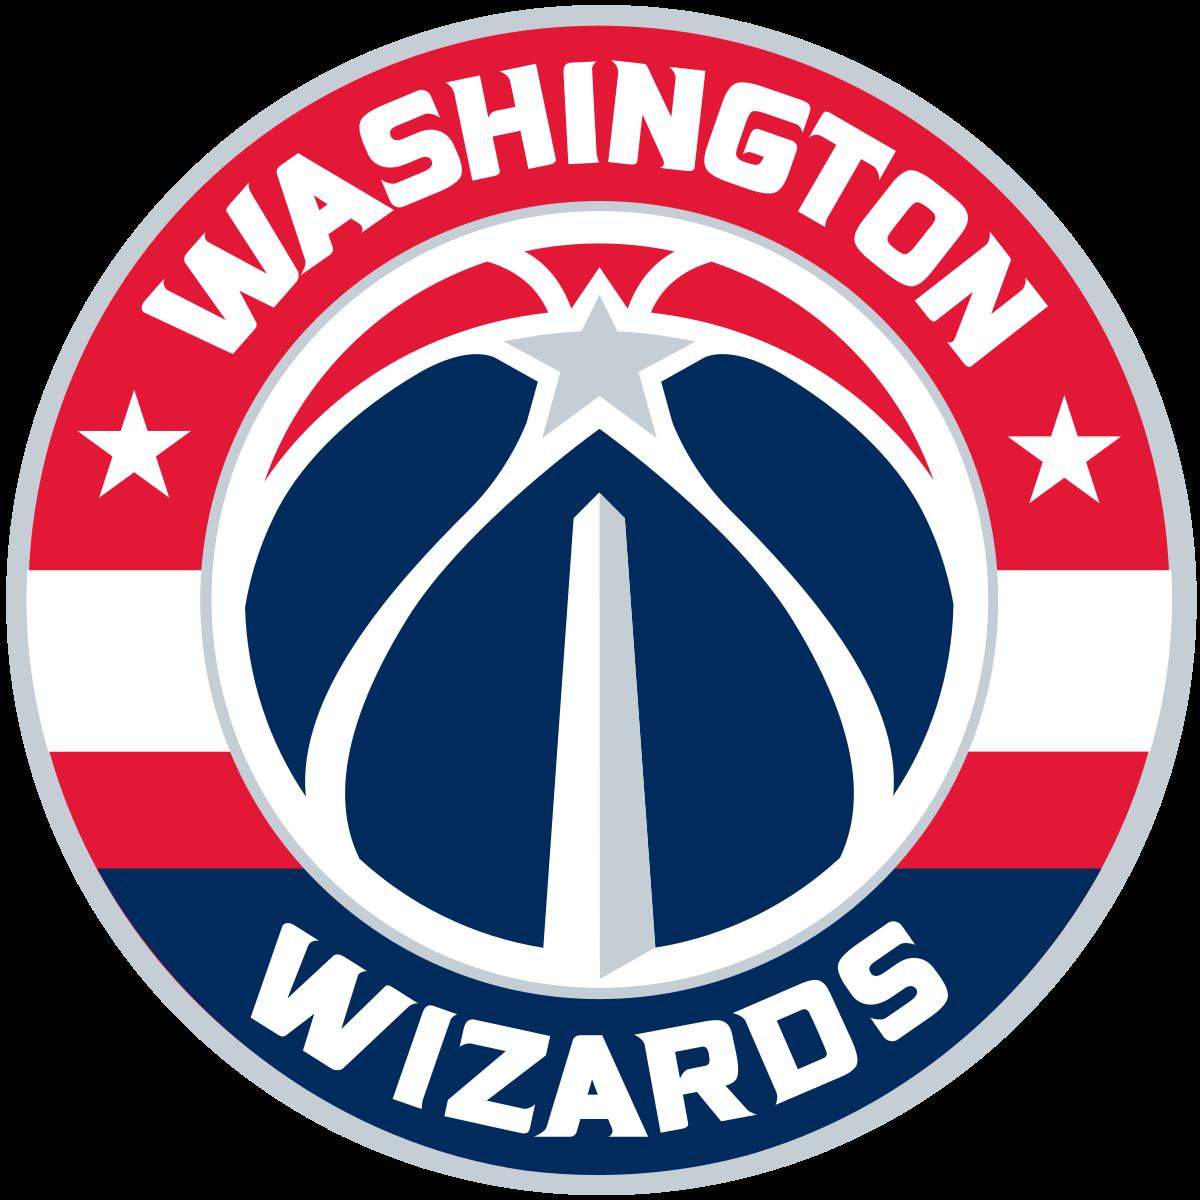 1200px-Washington_Wizards_logo.png